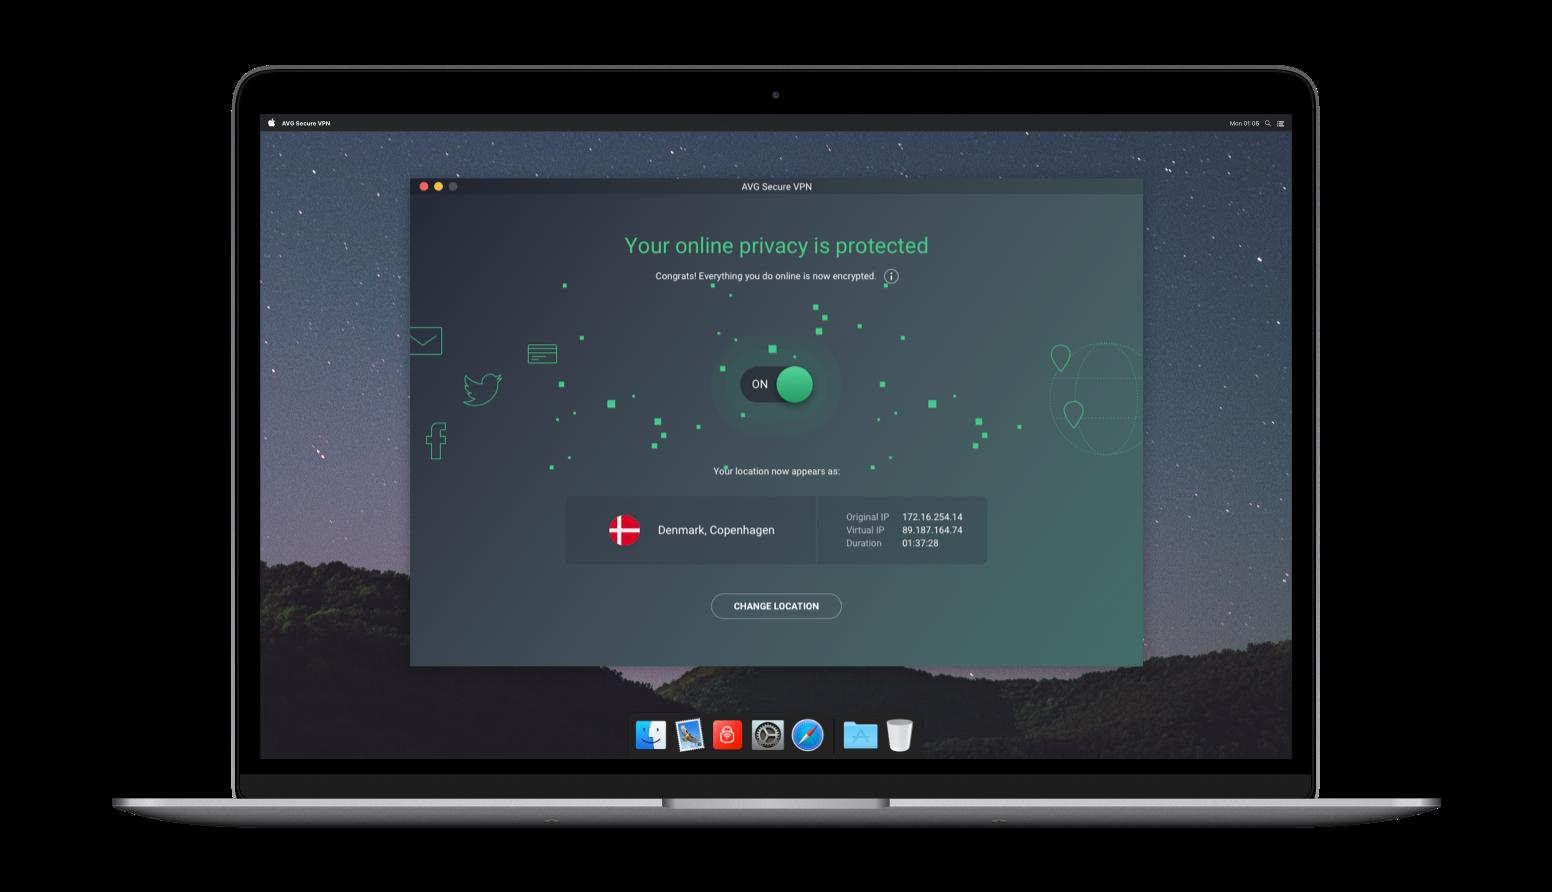 Free VPN Download for Mac | AVG Secure VPN